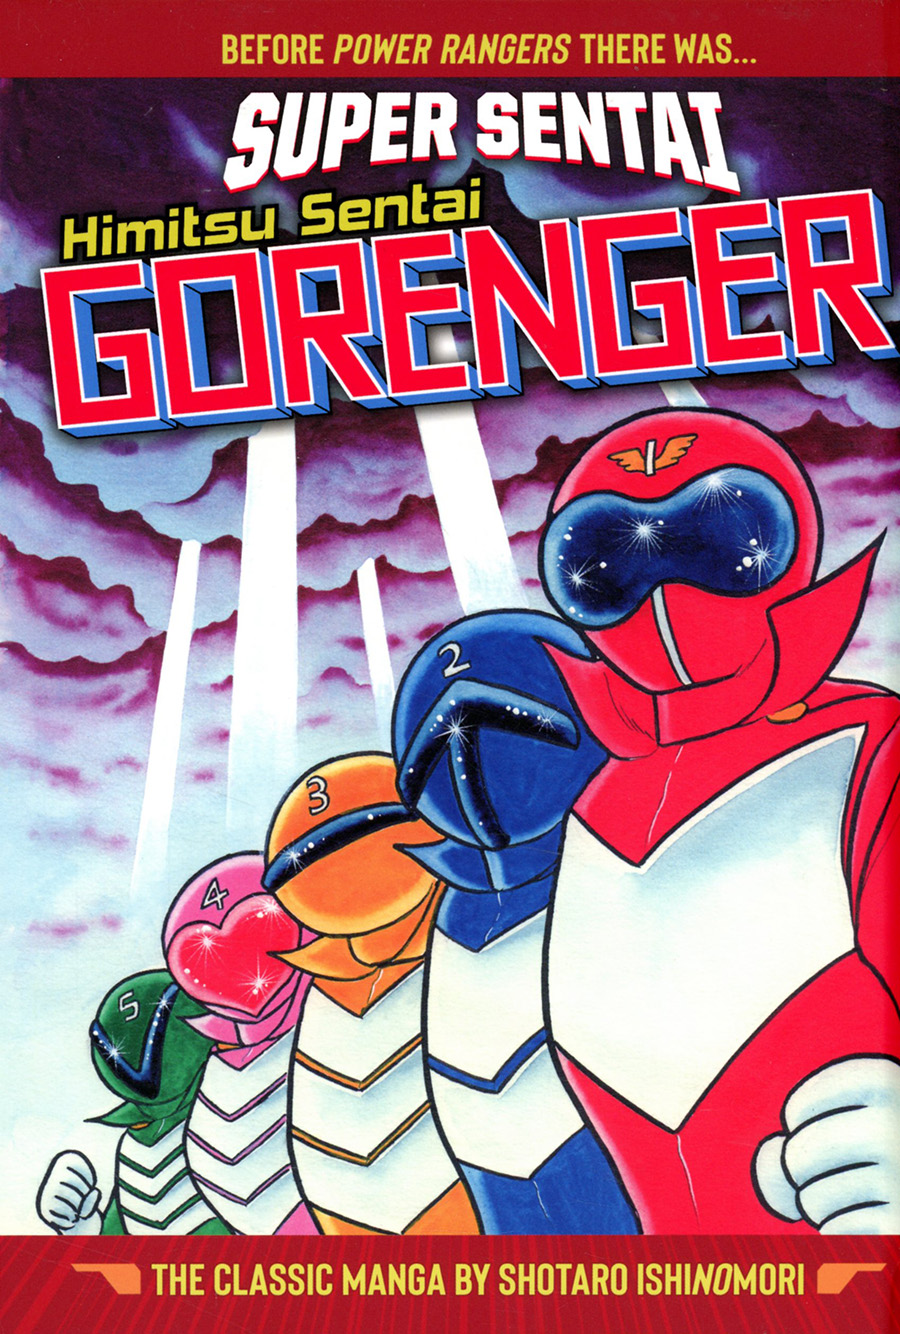 Super Sentai Himitsu Sentai Gorenger Classic Manga Collection HC